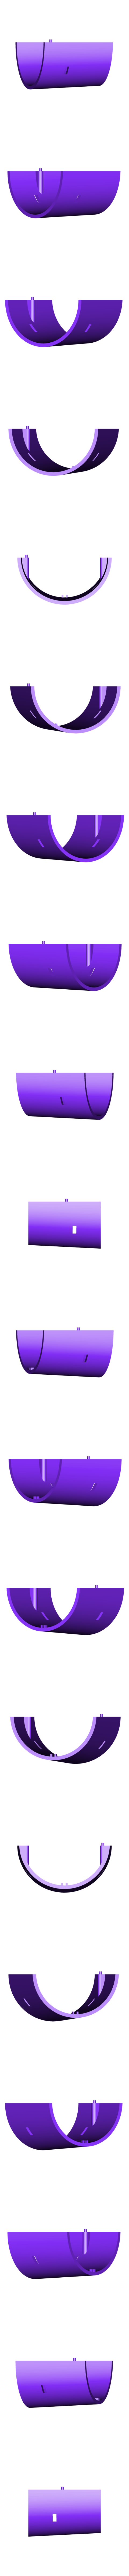 Smoke_Box_-_Part_2-.STL Download free STL file 4-8-8-4 Big Boy Locomotive • 3D printer object, RaymondDeLuca